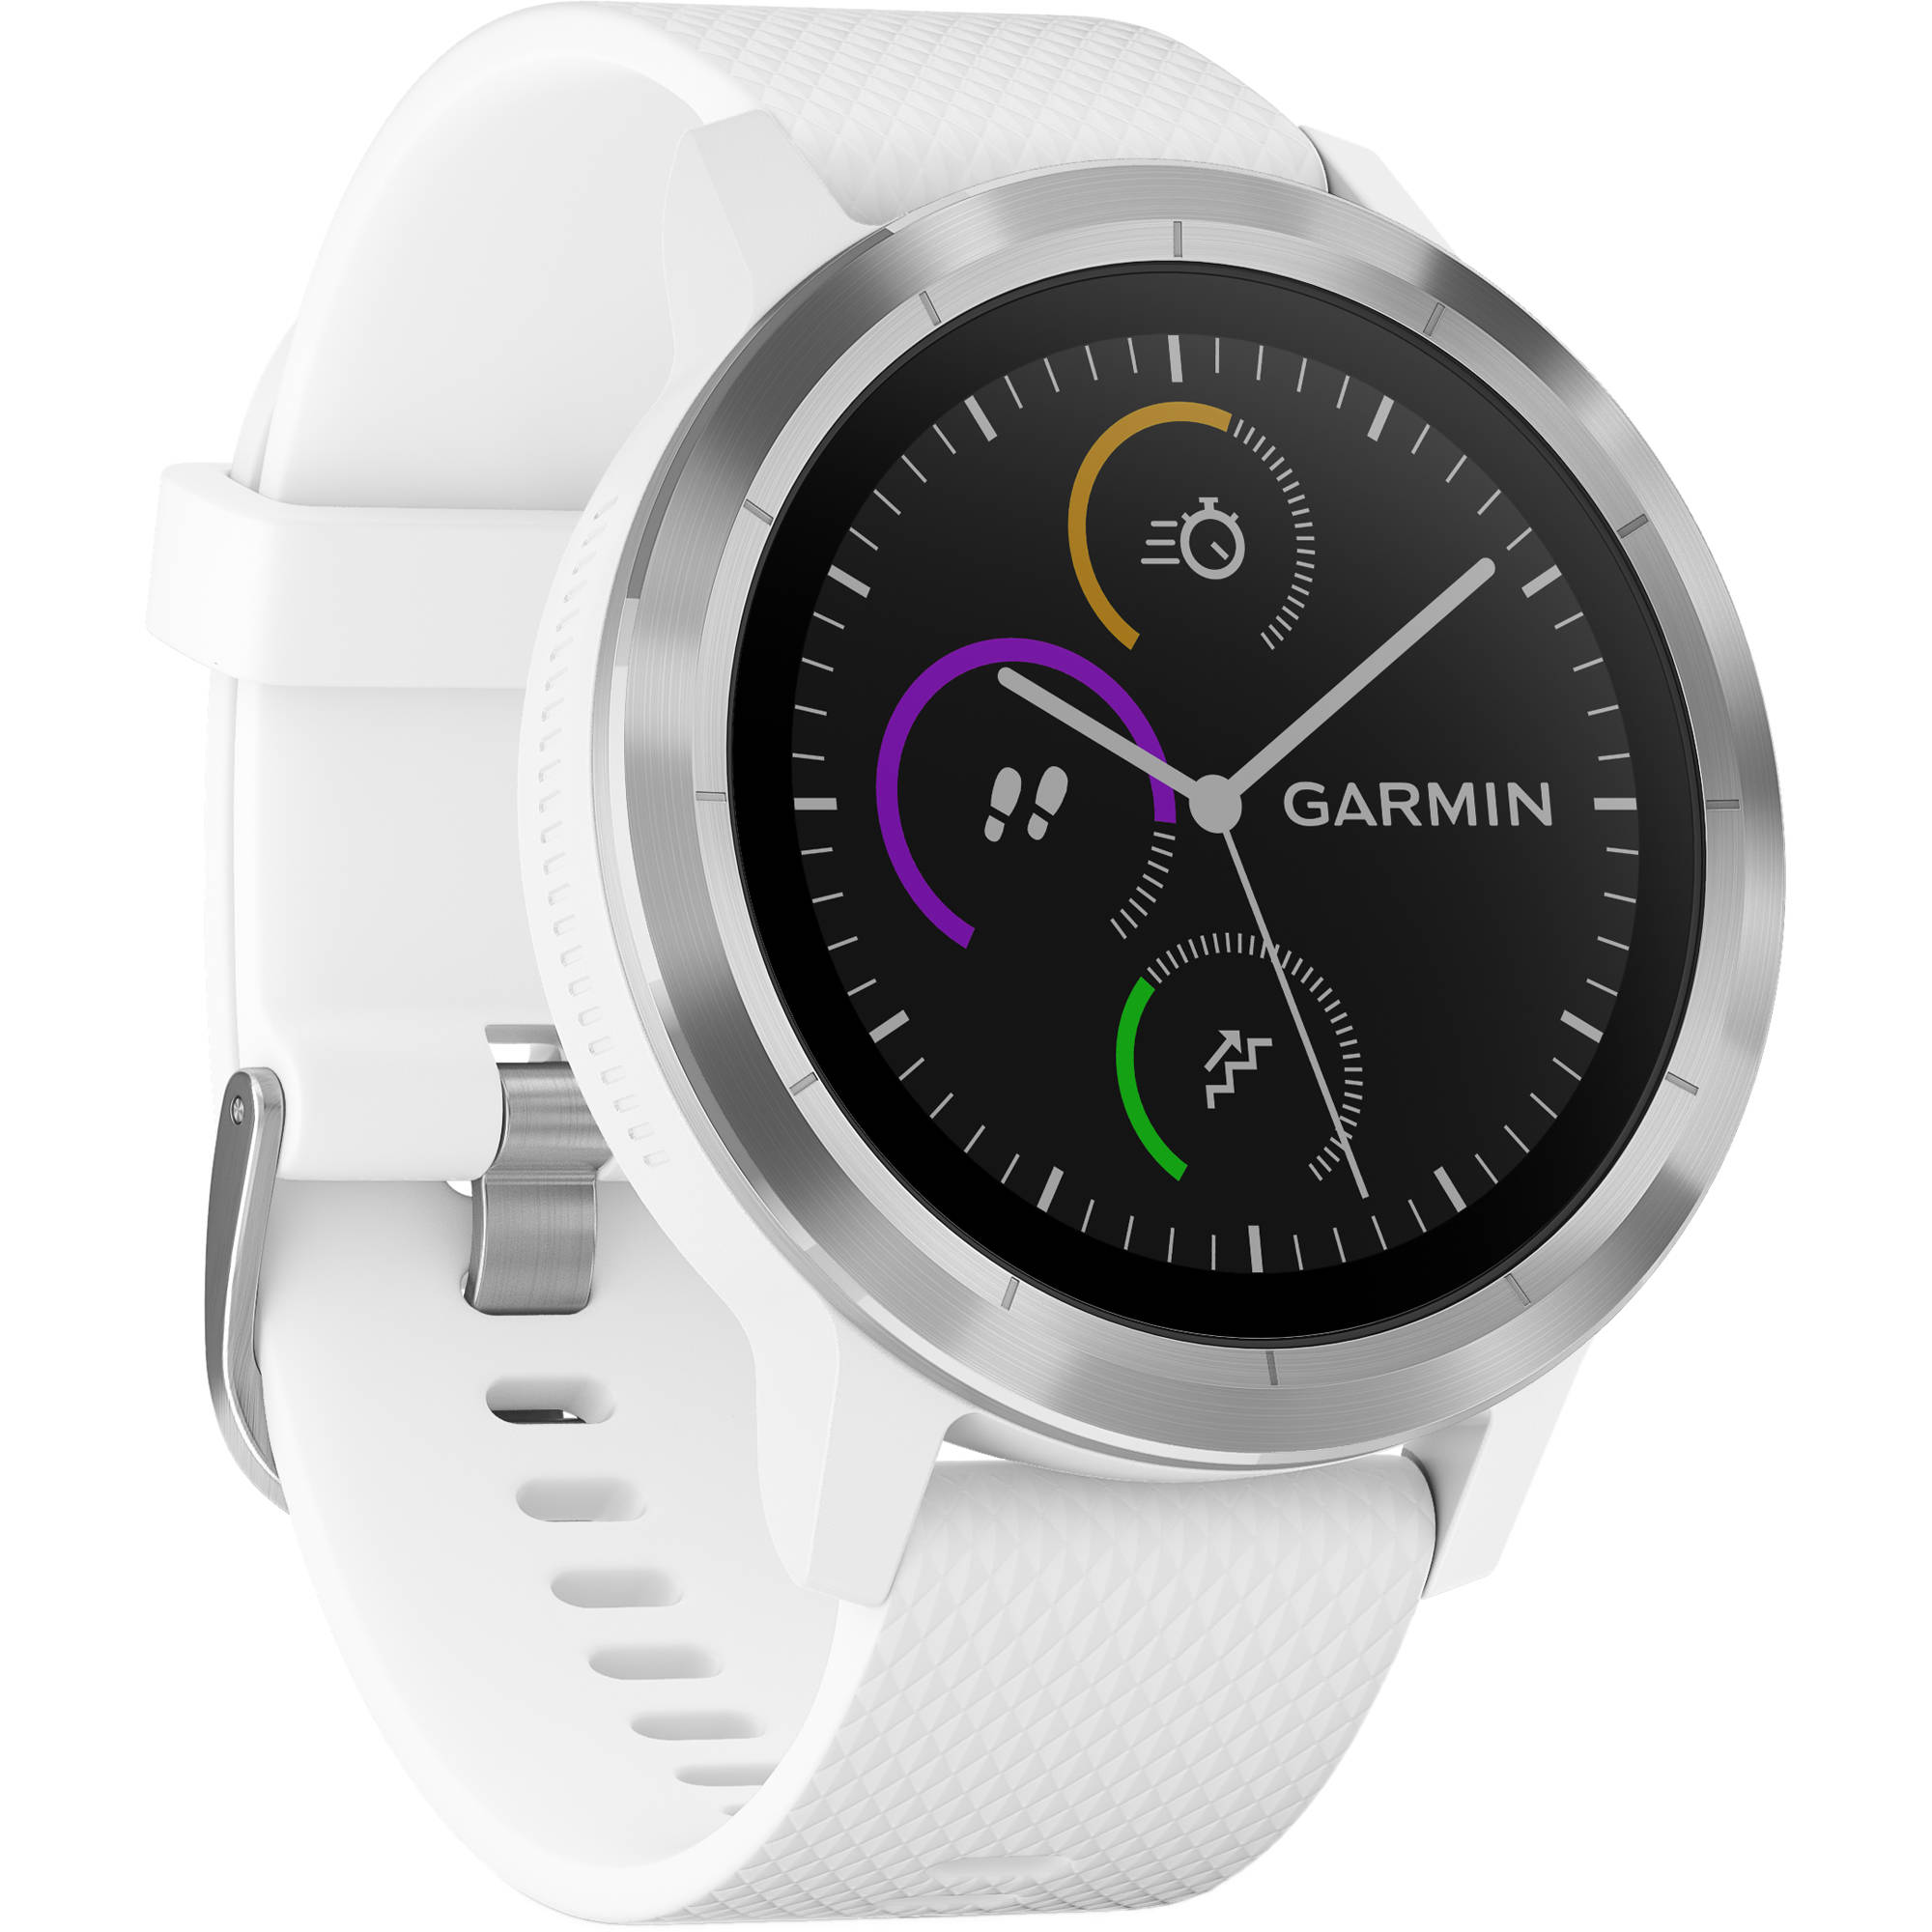 aa8d112bb9 Garmin vivoactive 3 (White with Stainless Hardware) 010-01769-21